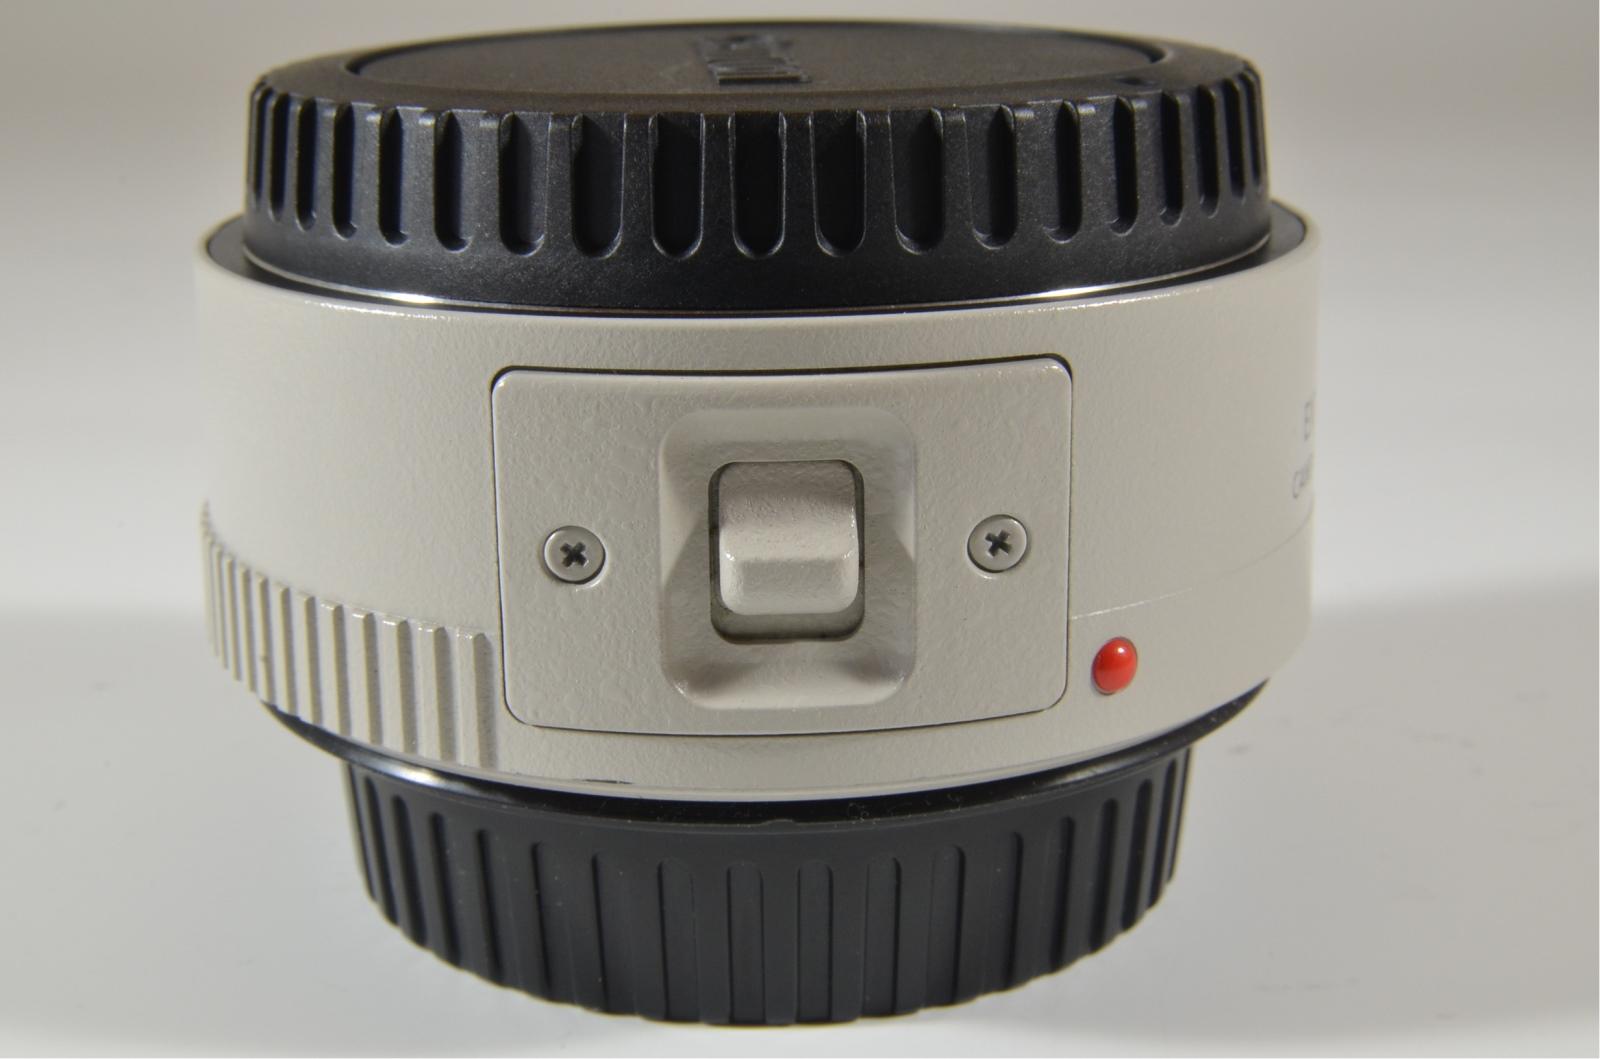 canon extender ef 1.4 x ii teleconverter